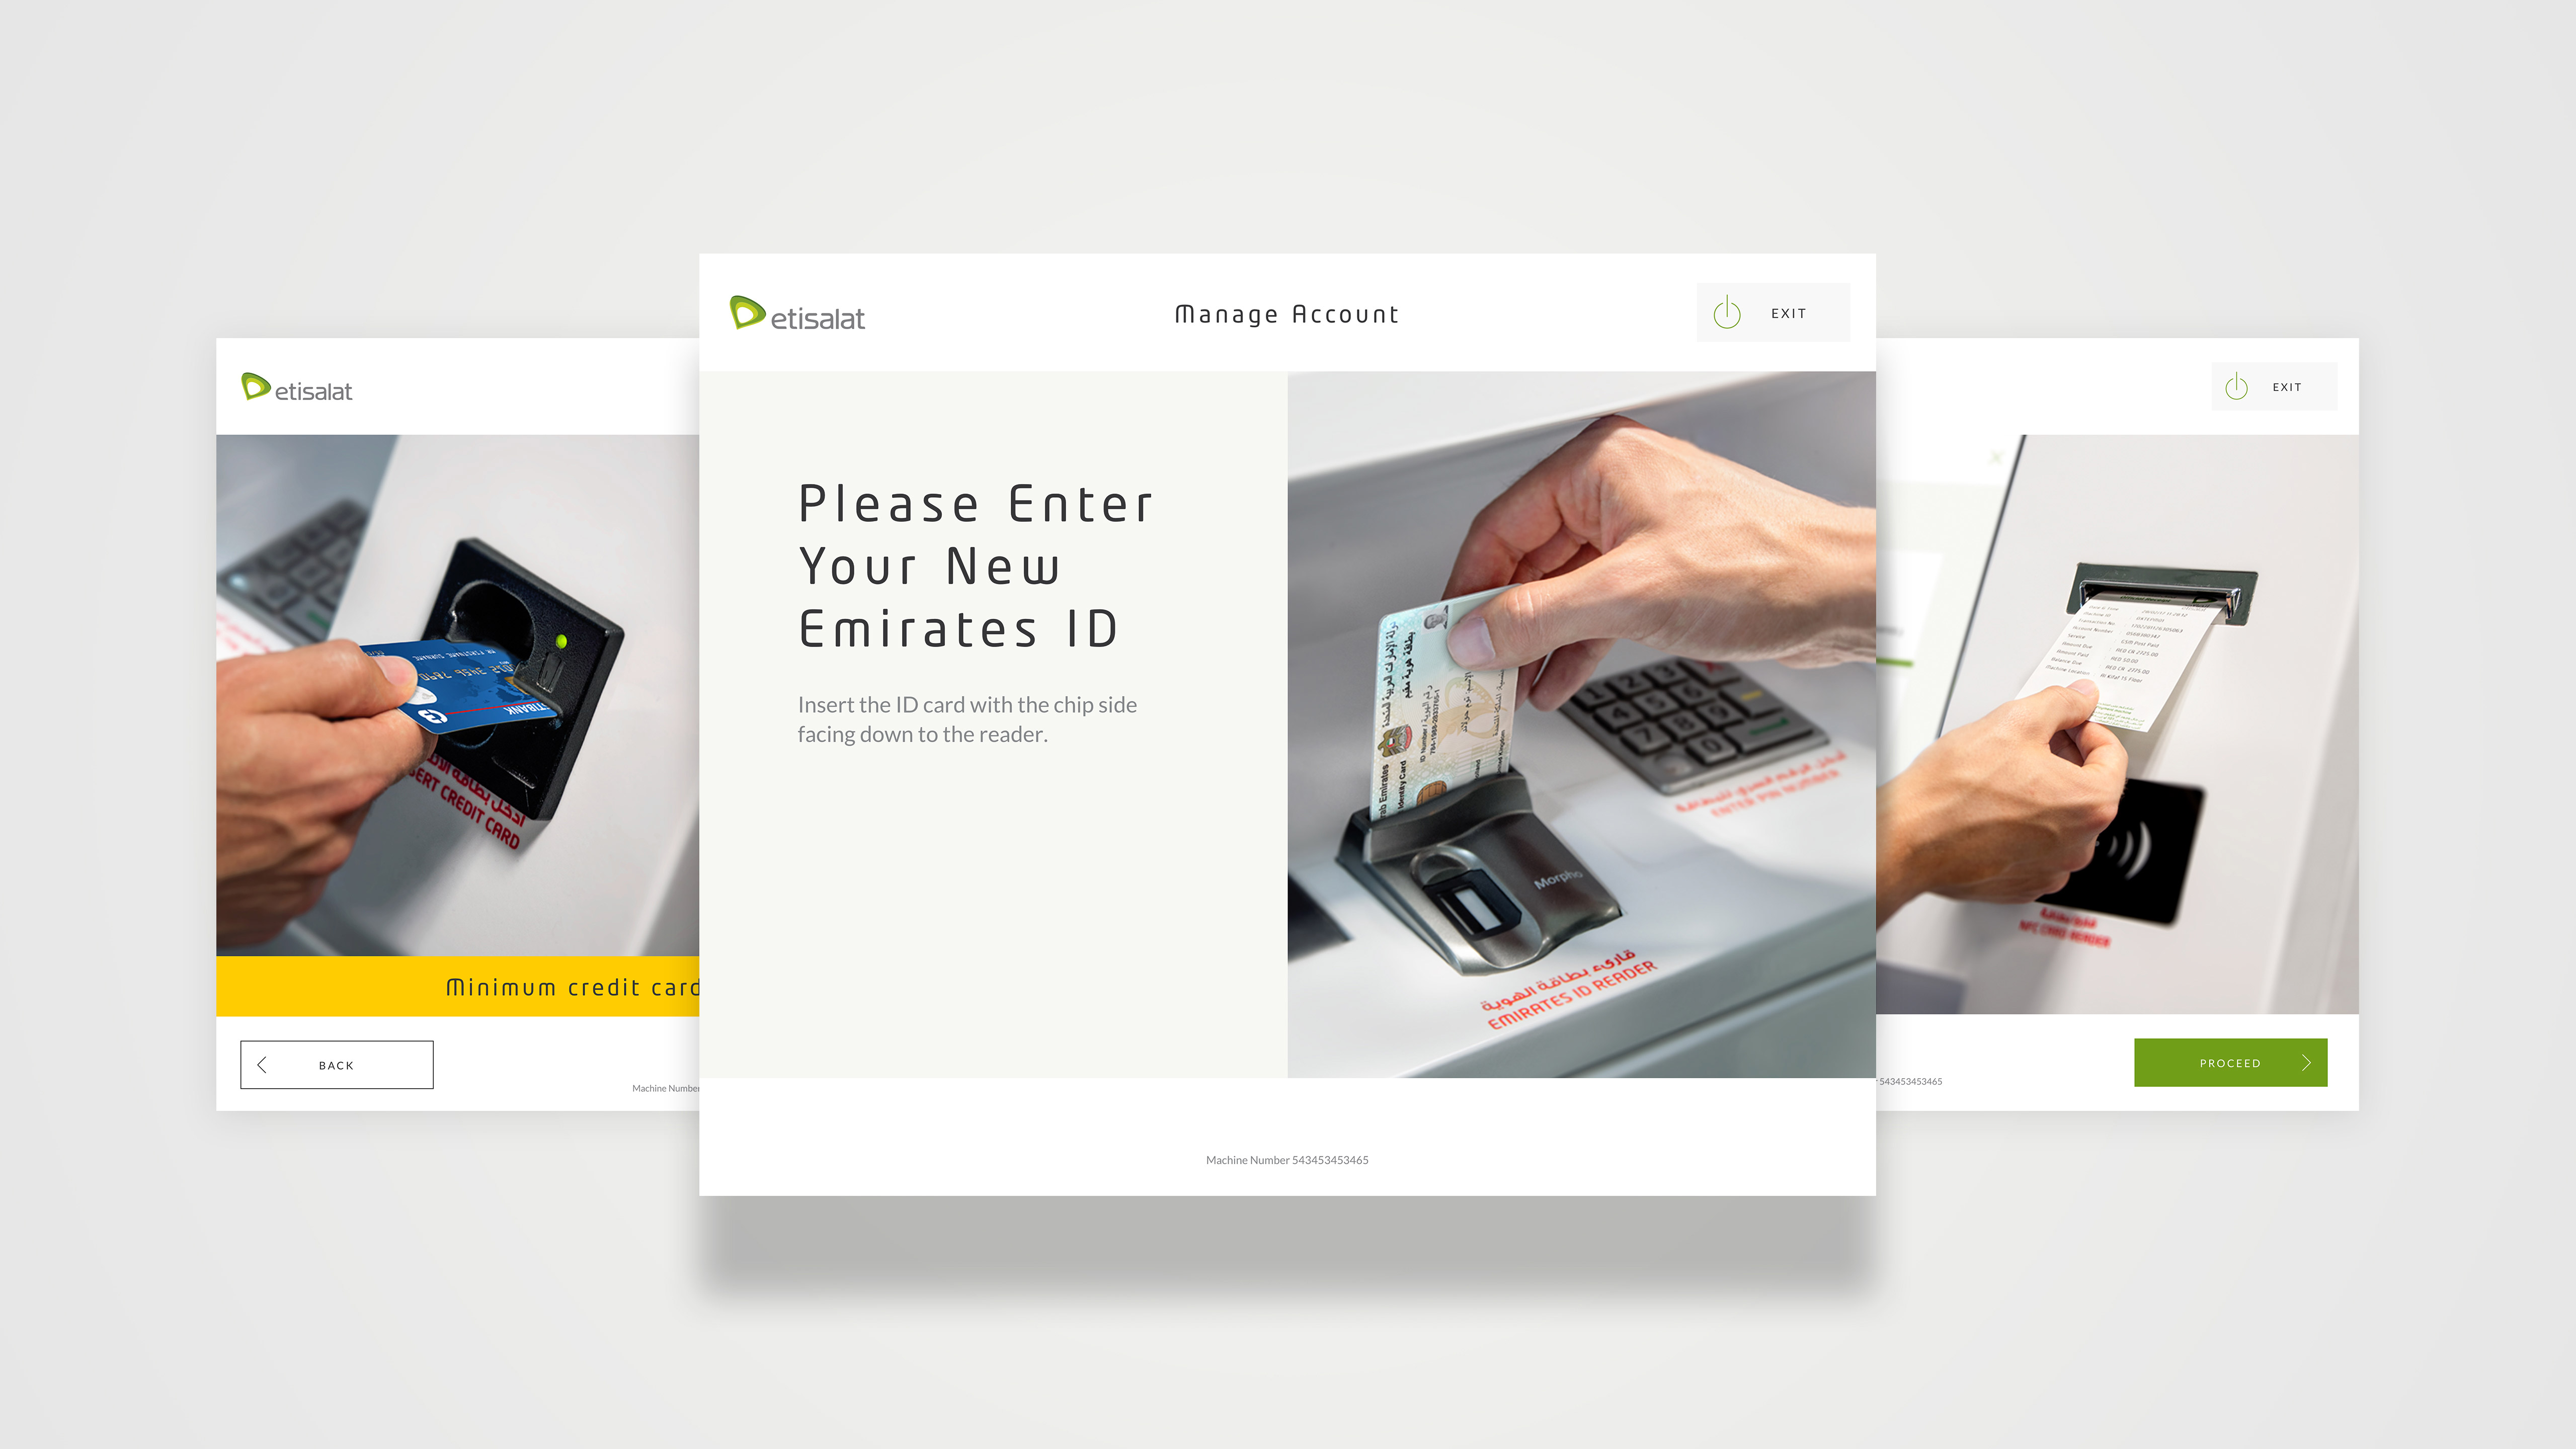 etisalat_design_system_081